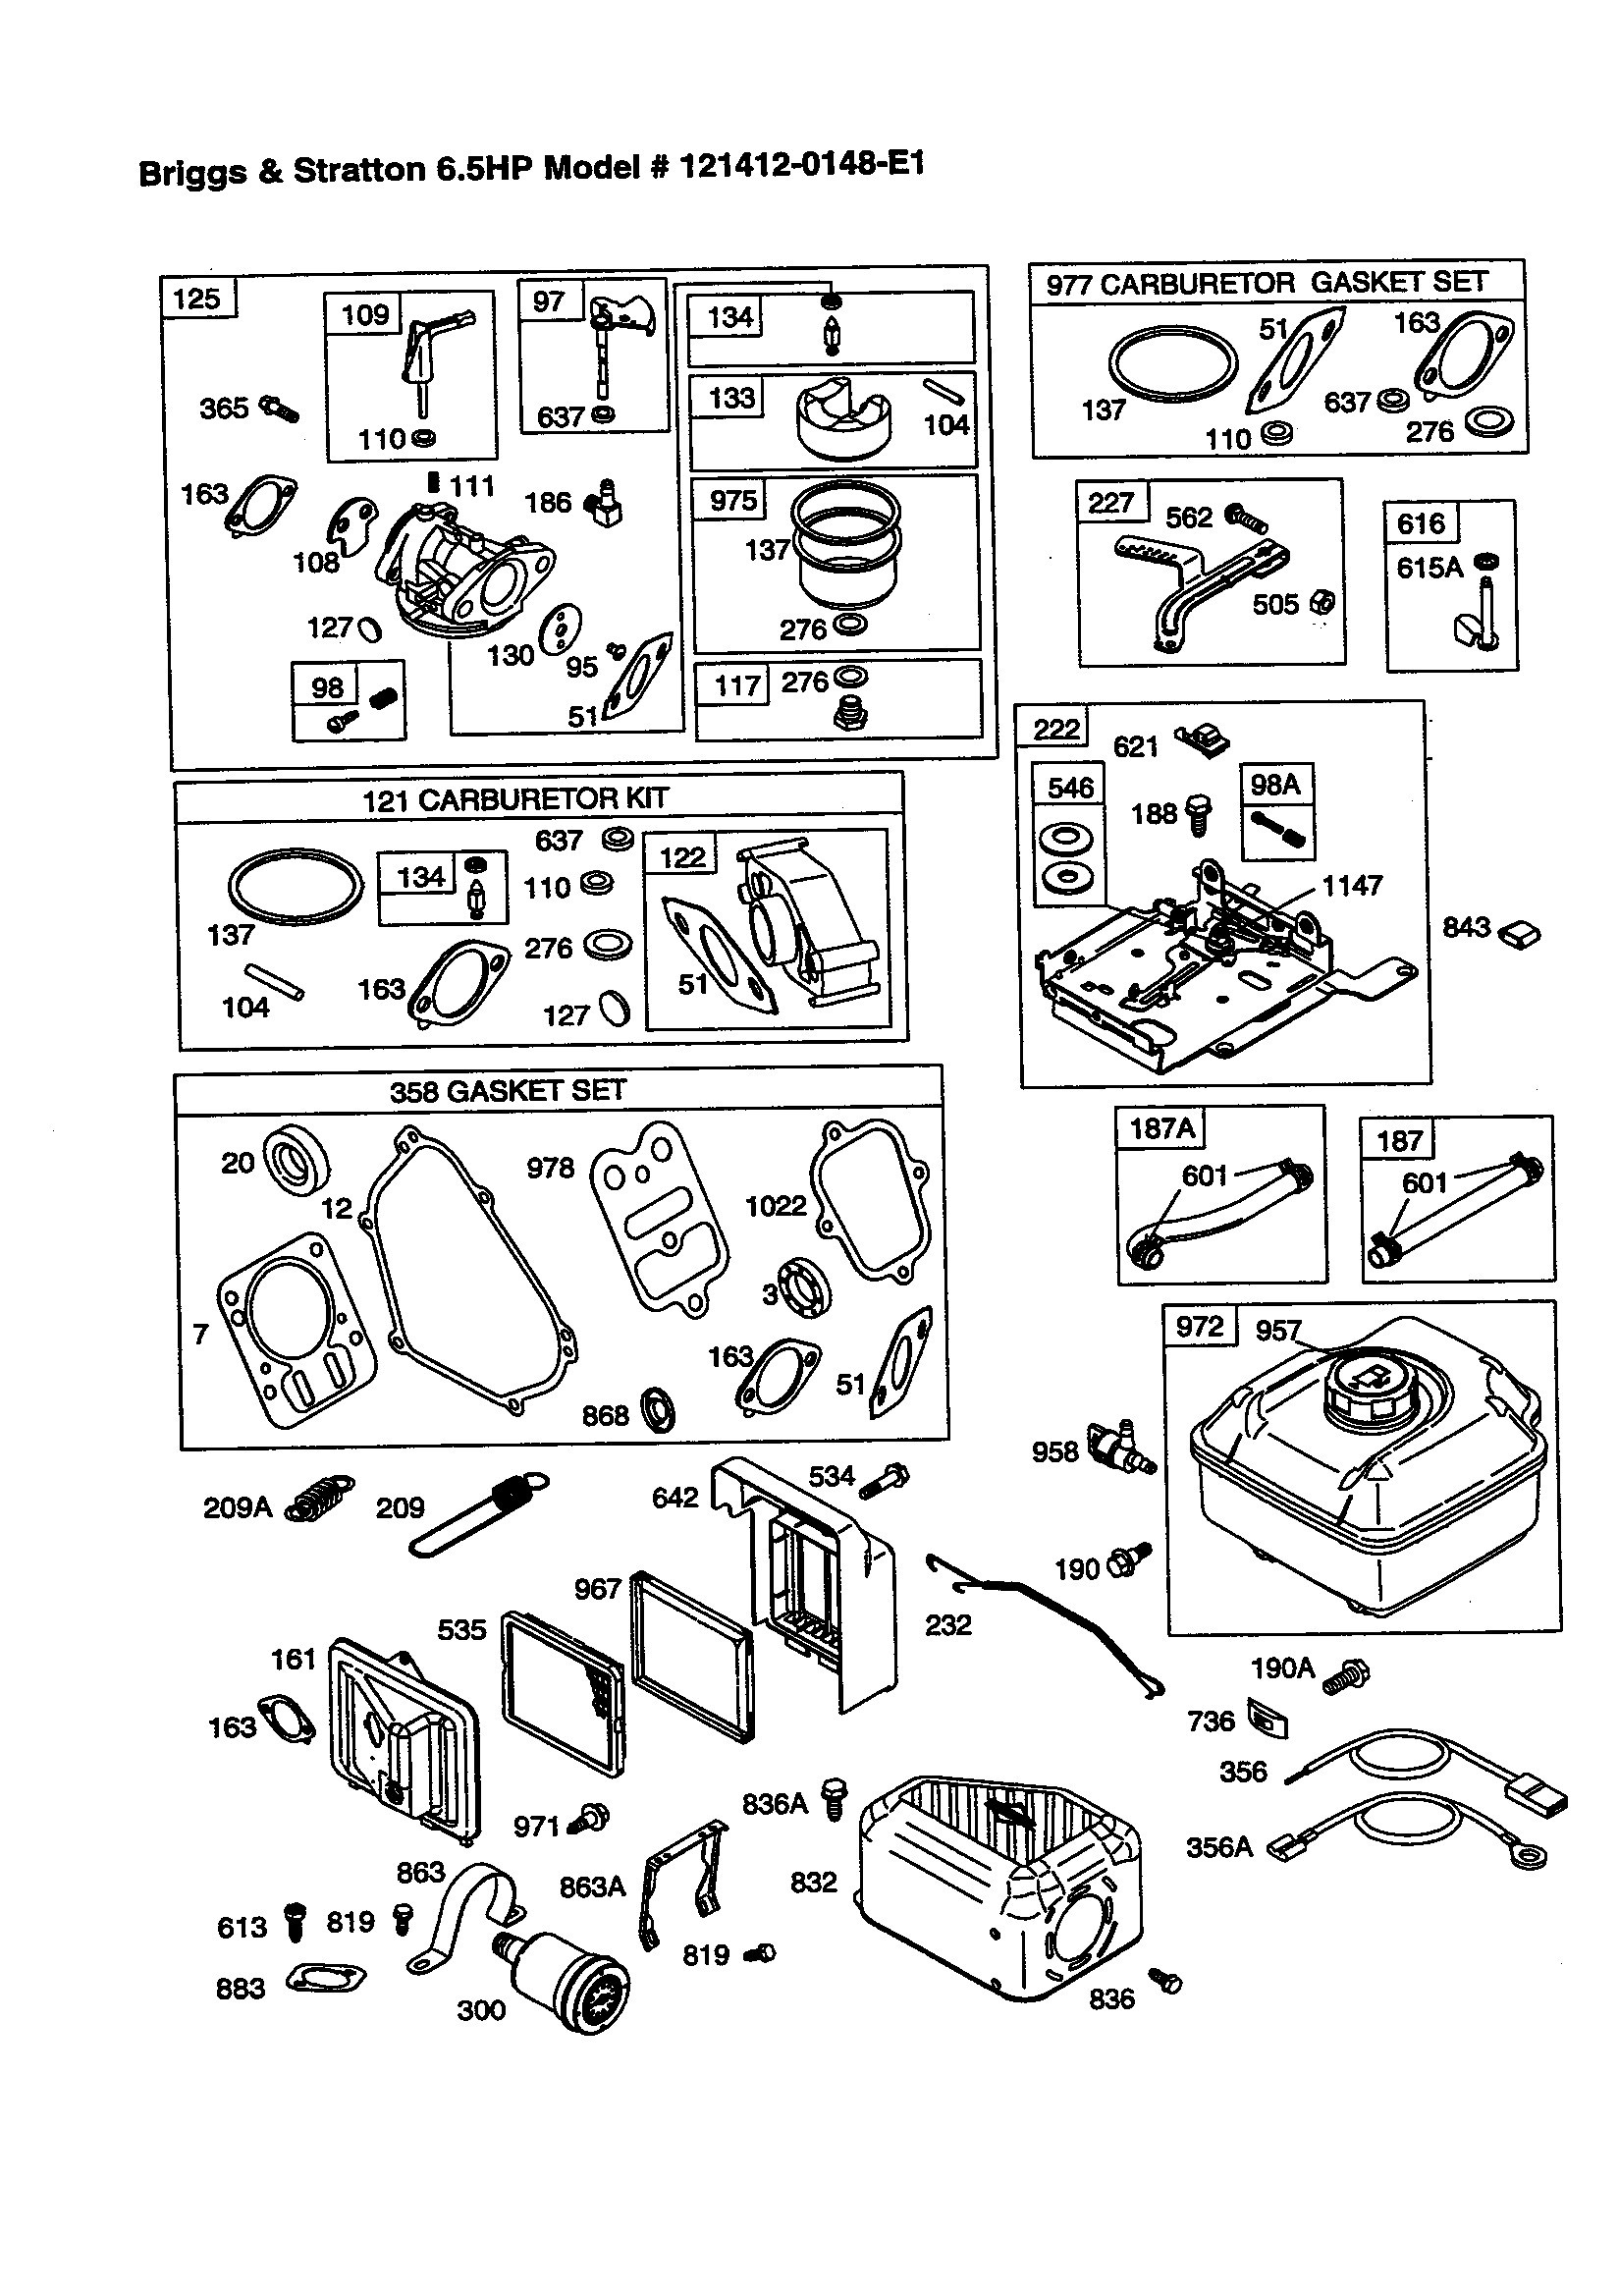 ideal briggs stratton engine diagram 2 briggs stratton parts diagram dl68